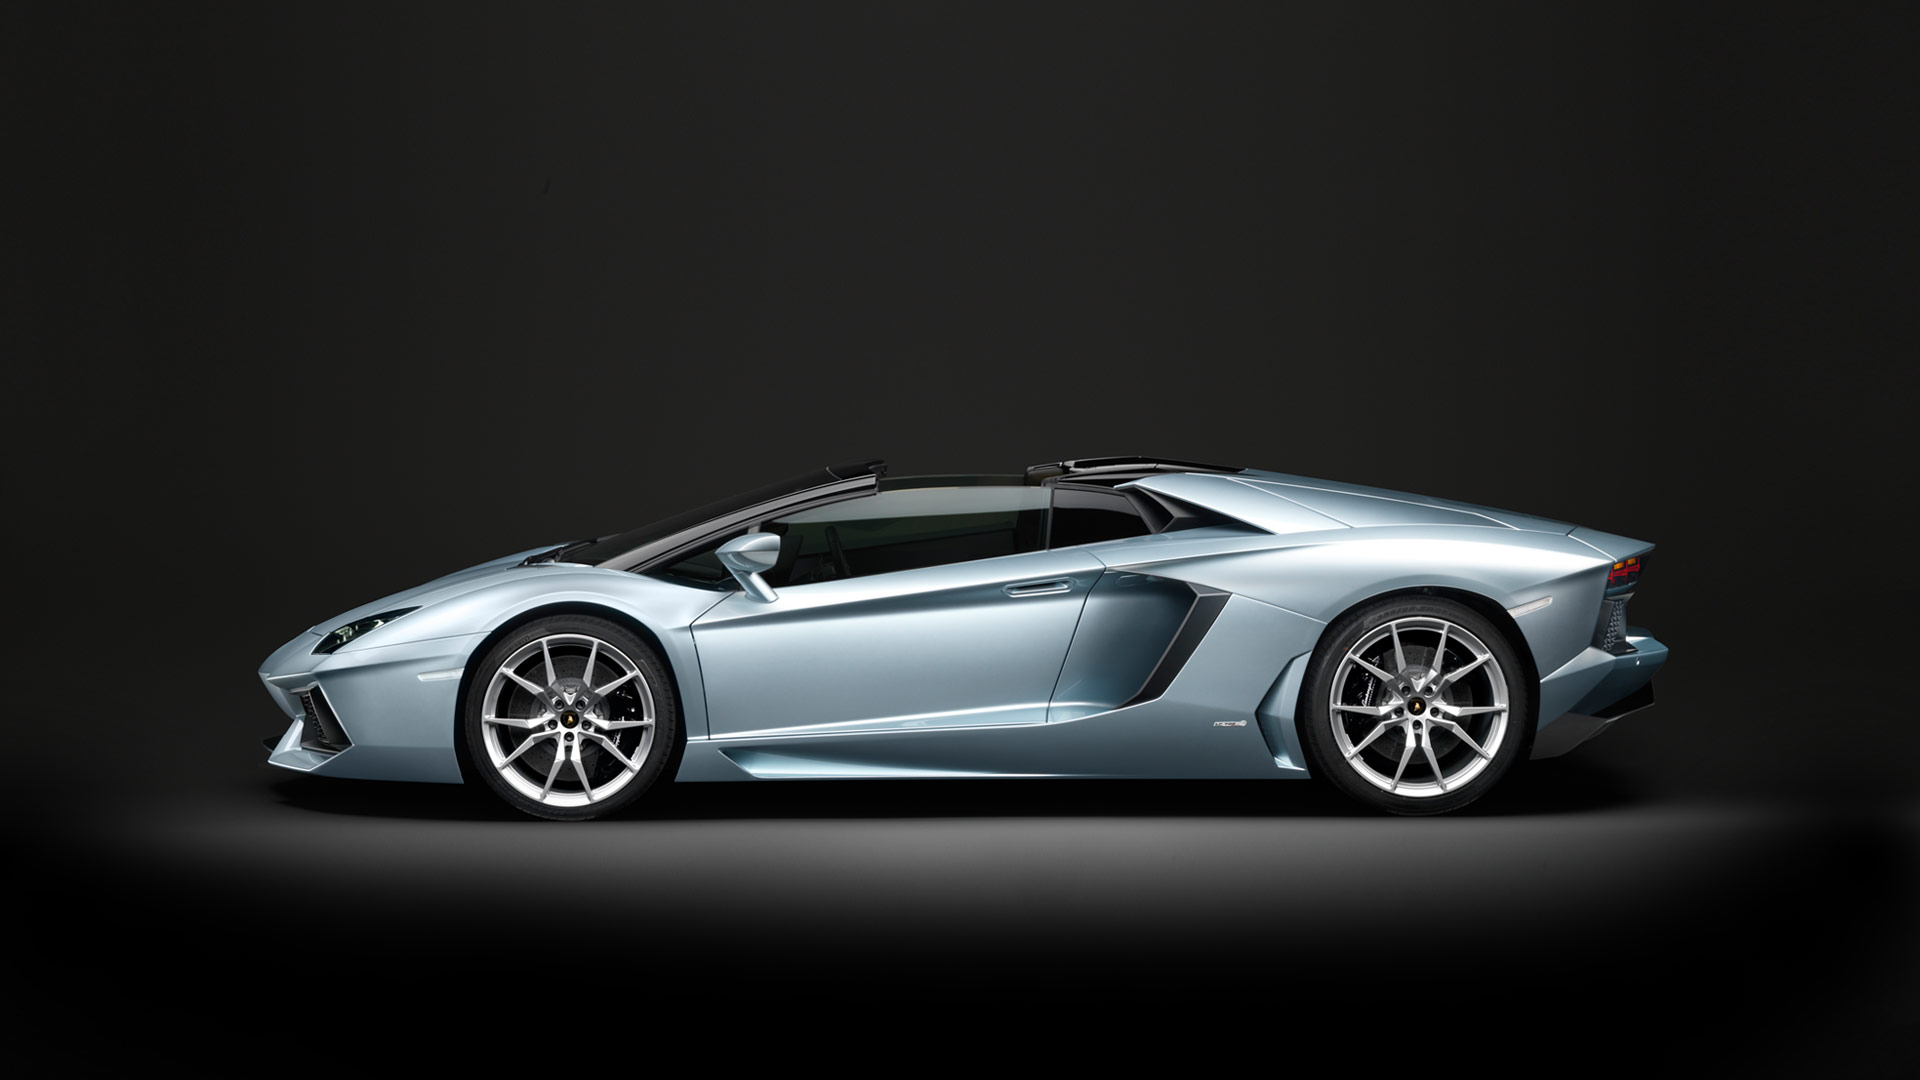 Car Lamborghini Aventador LP 700-4 Roadster